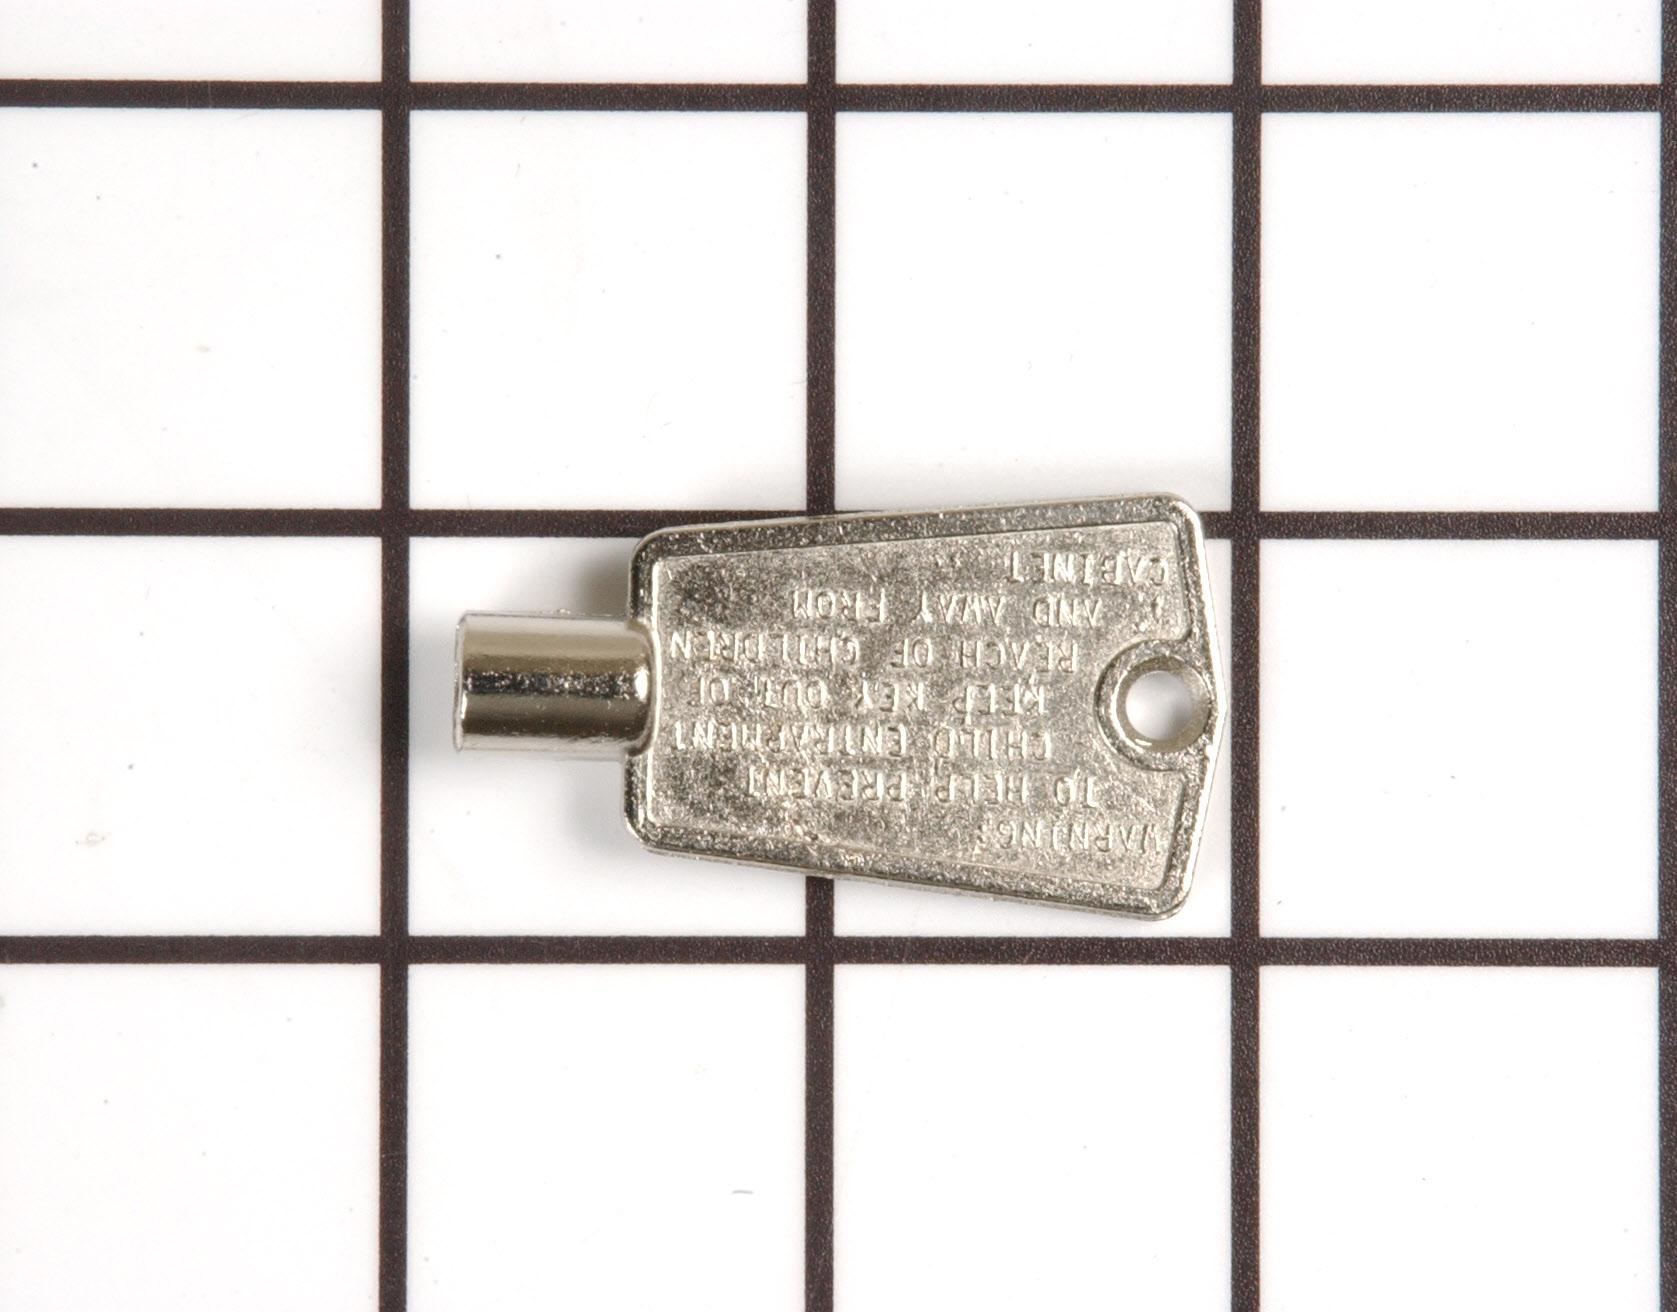 Maytag Freezer Part # WP4356840 - Door Key